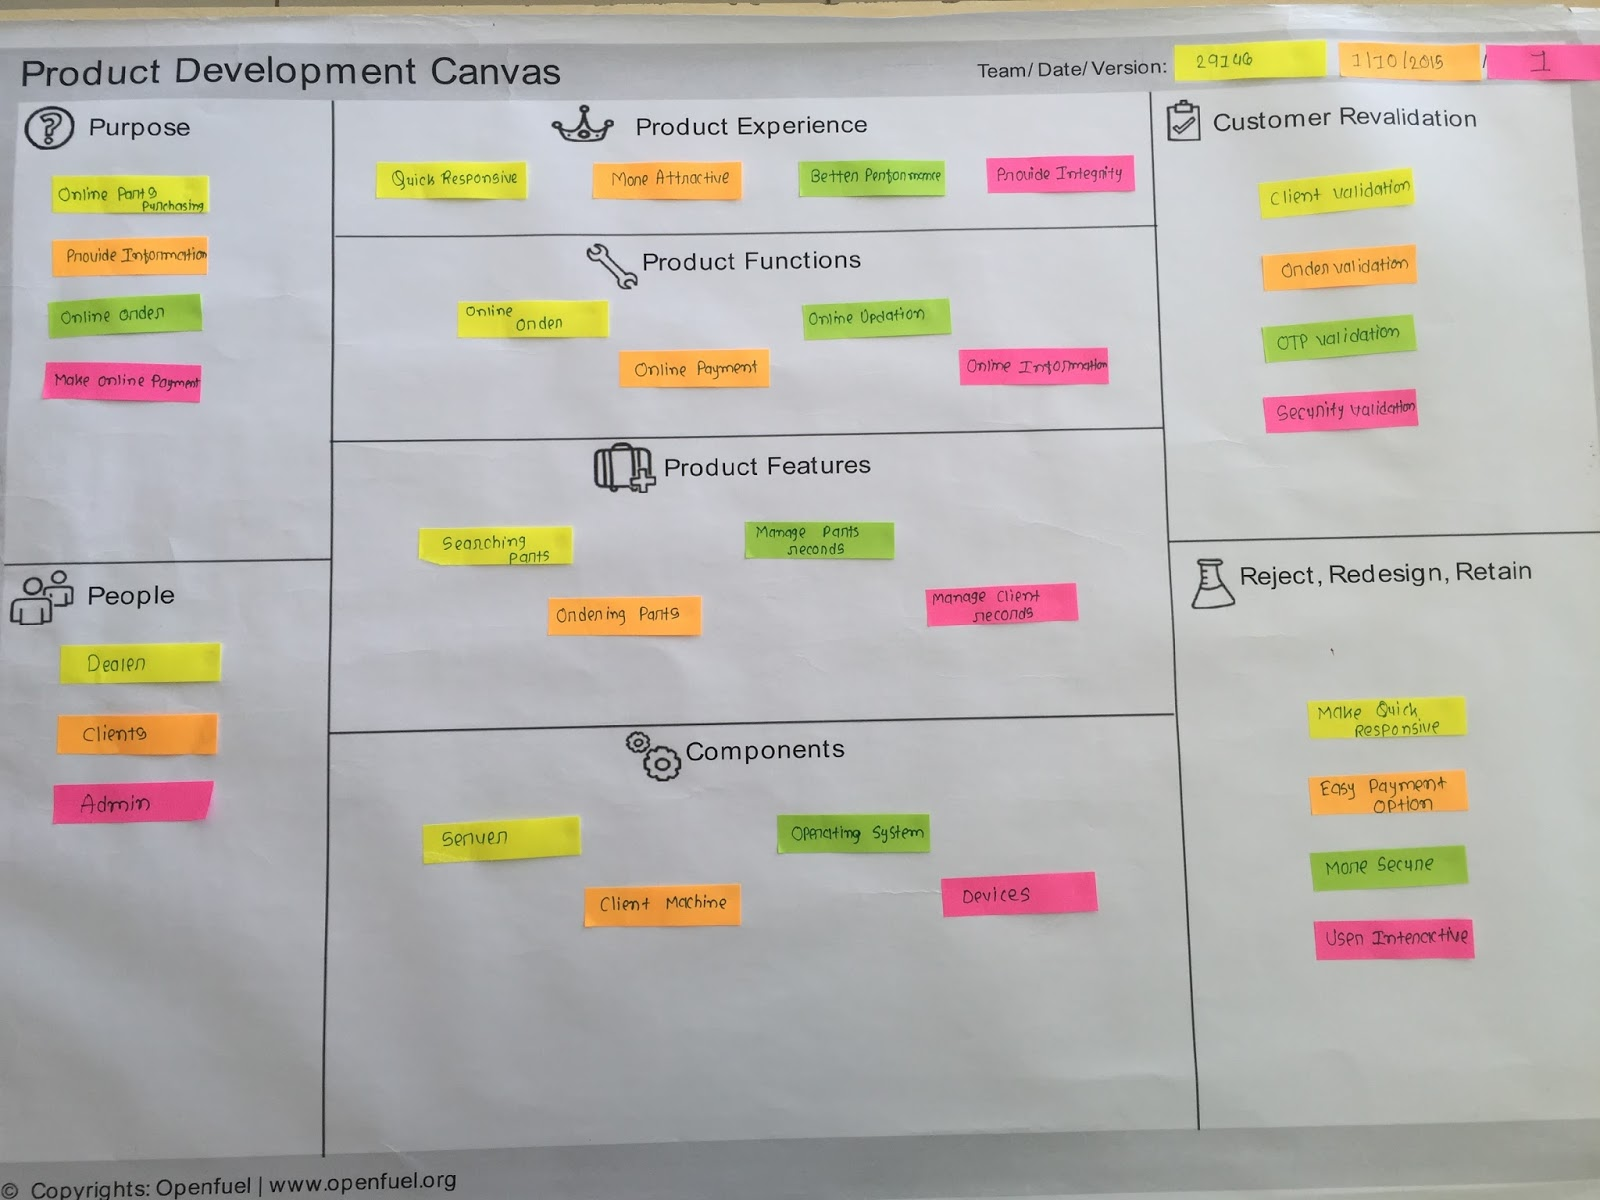 satish dodiya: Product development Canvas GTU